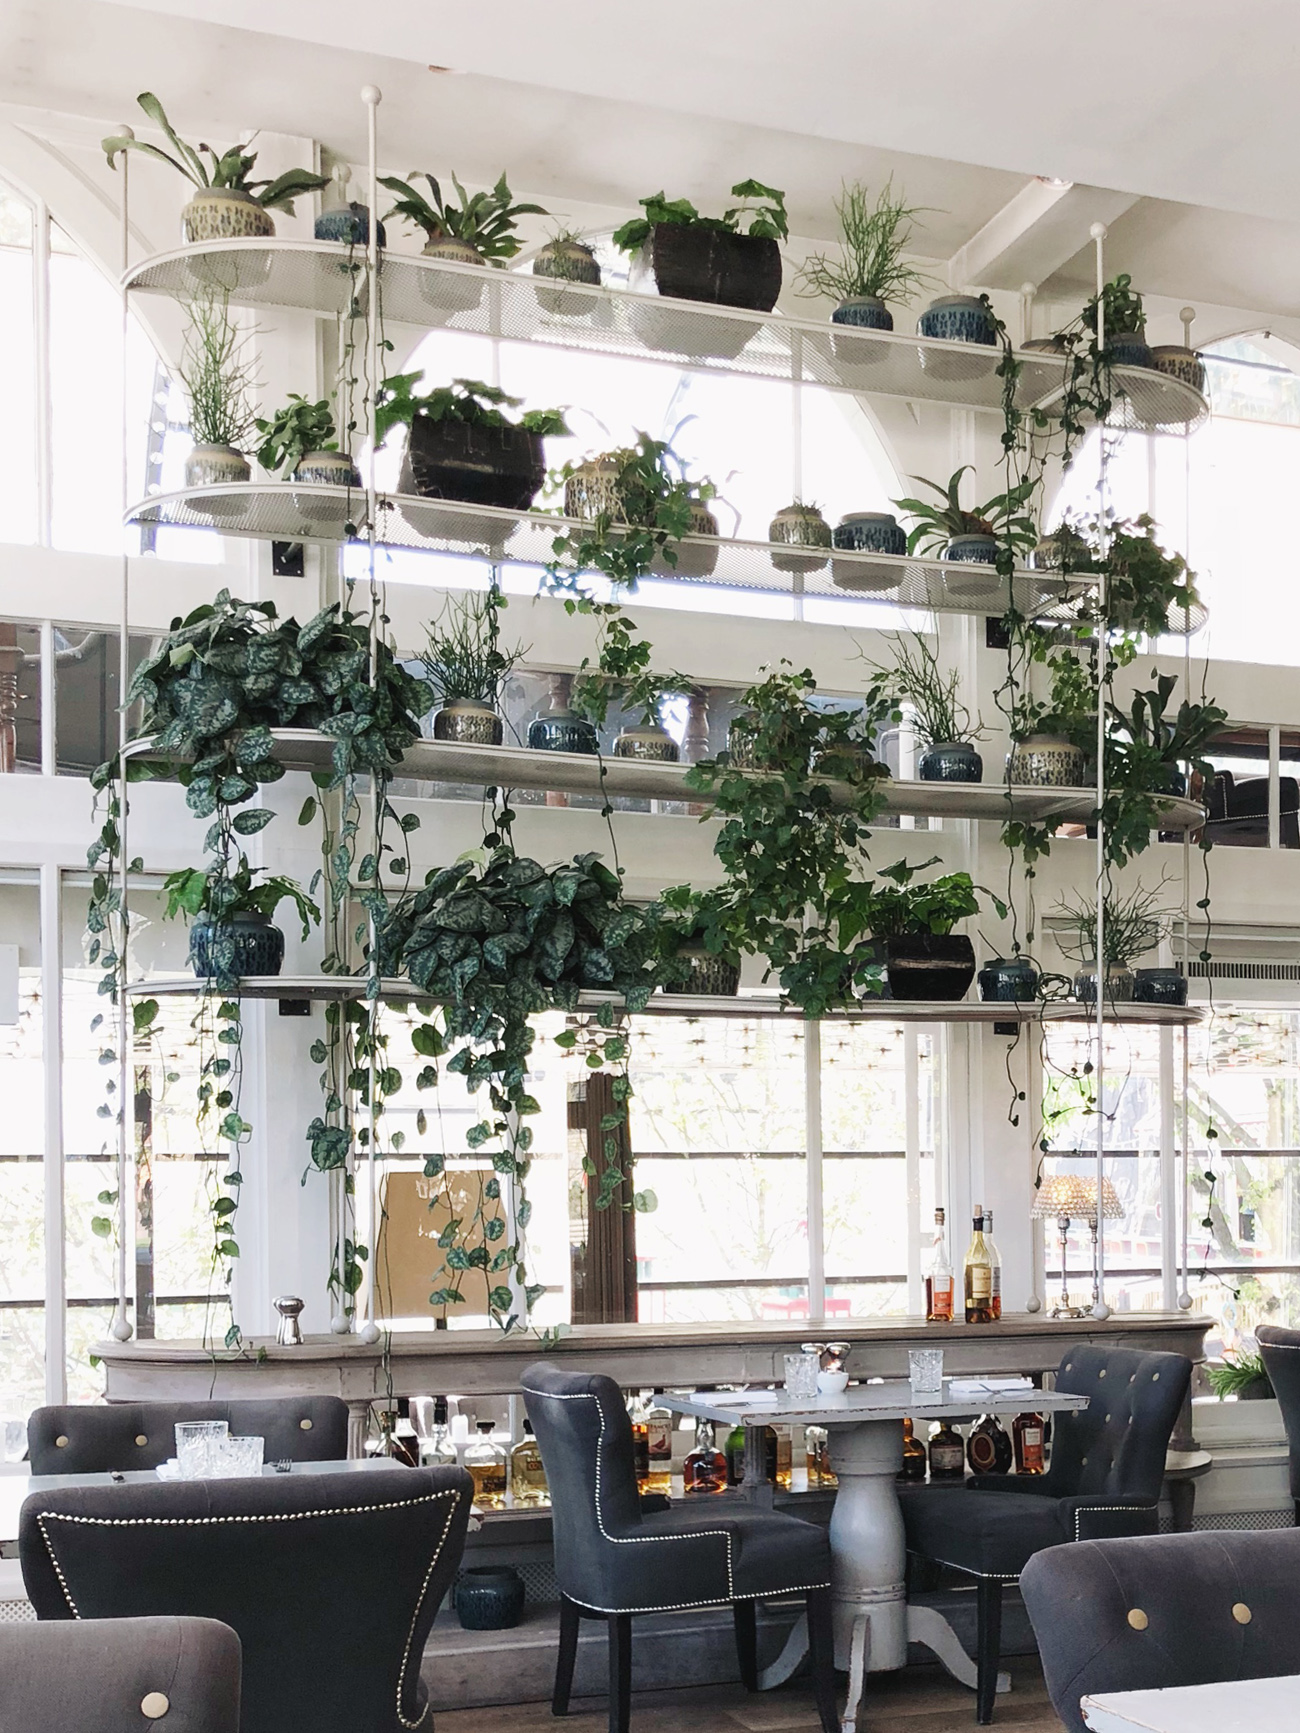 Plant Goals from Nimb Hotel Copenhagen